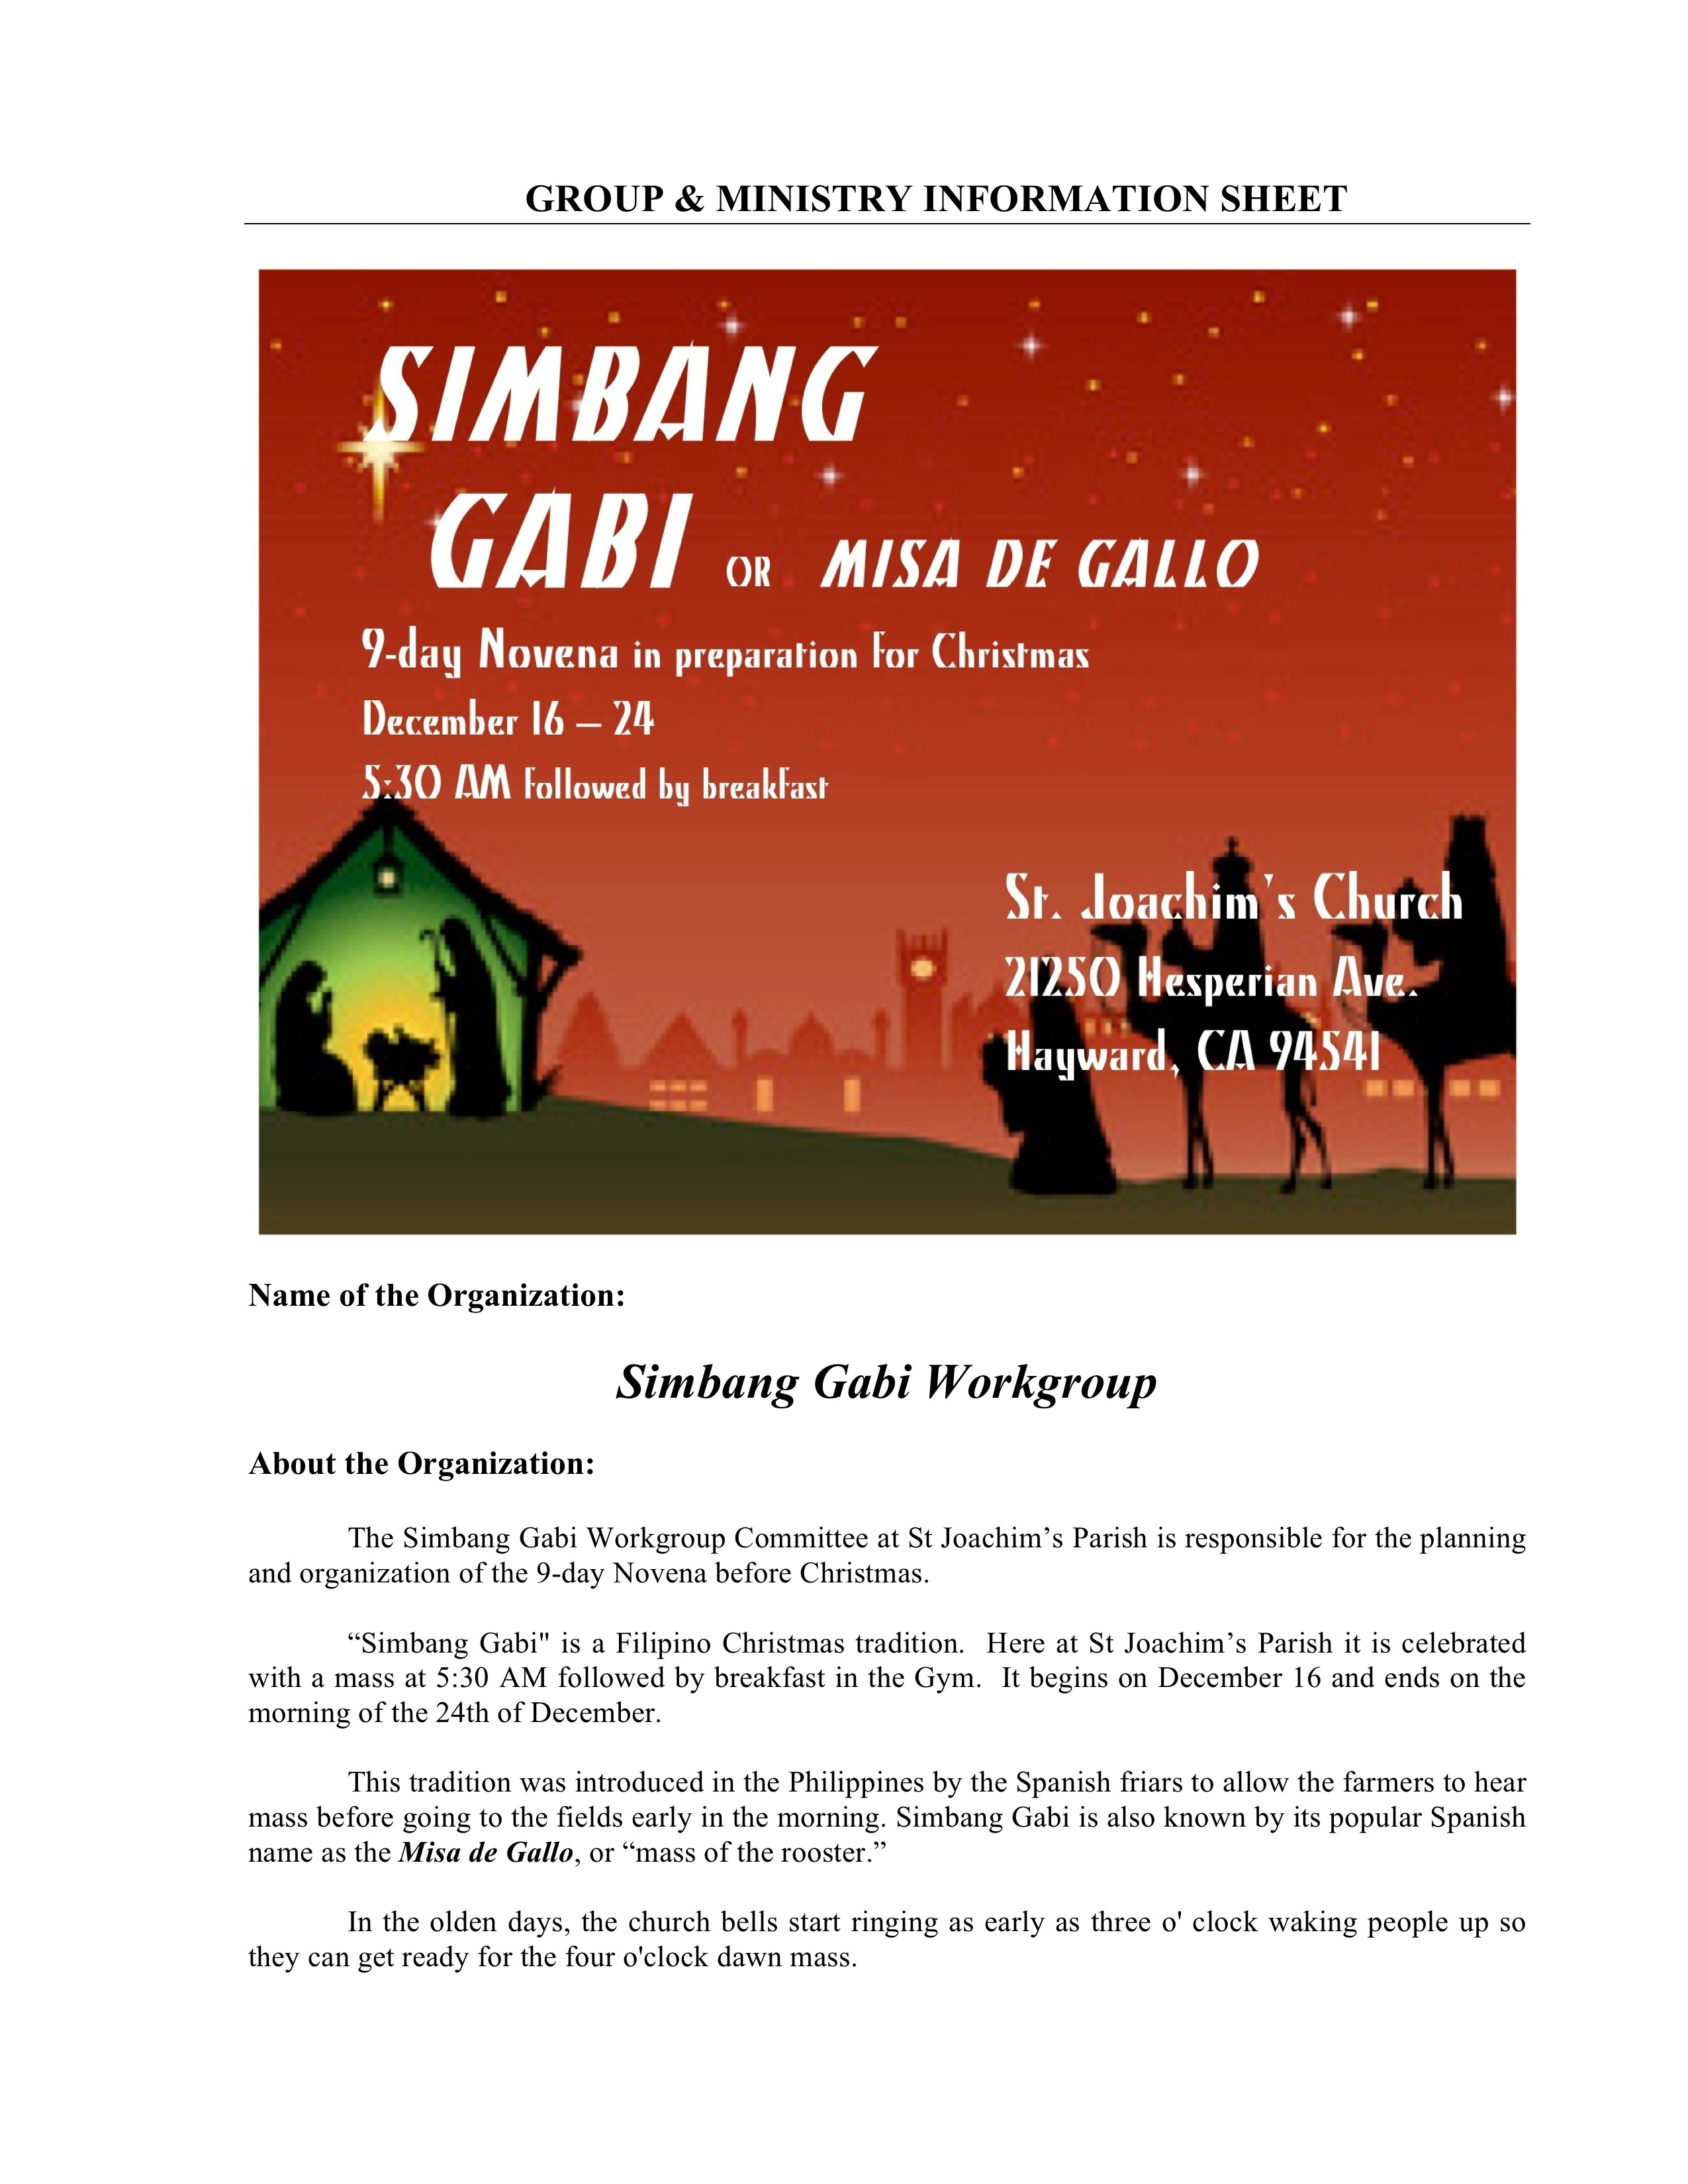 Simbang Gabi Ministry